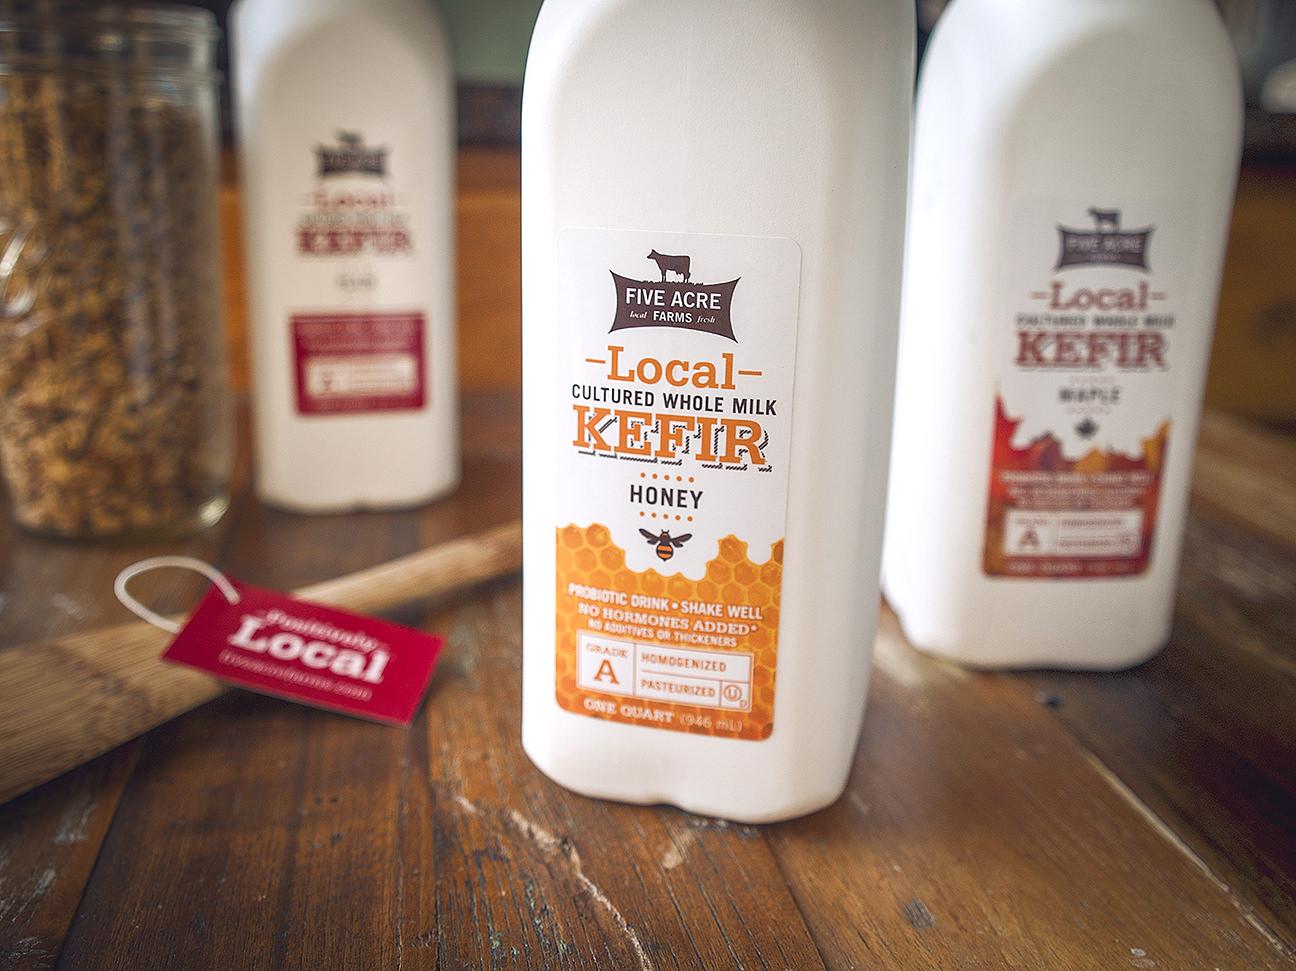 Local Kefir Five Acre Farms